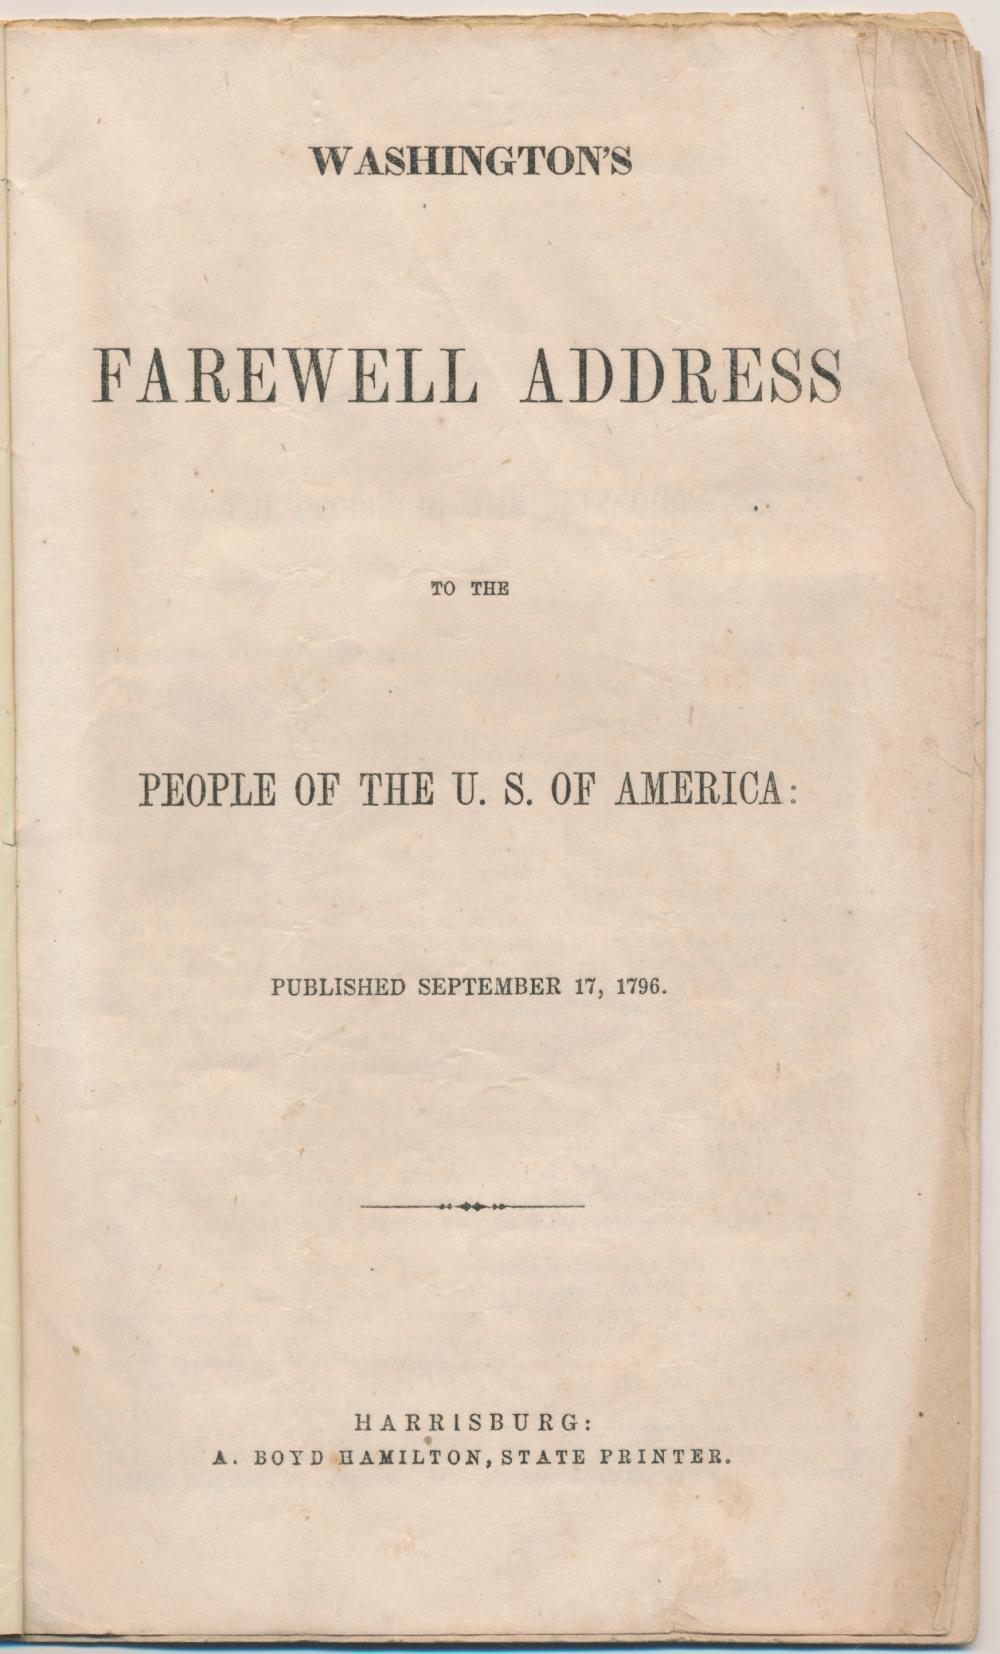 'WASHINGTON'S FAREWELL ADDRESS'